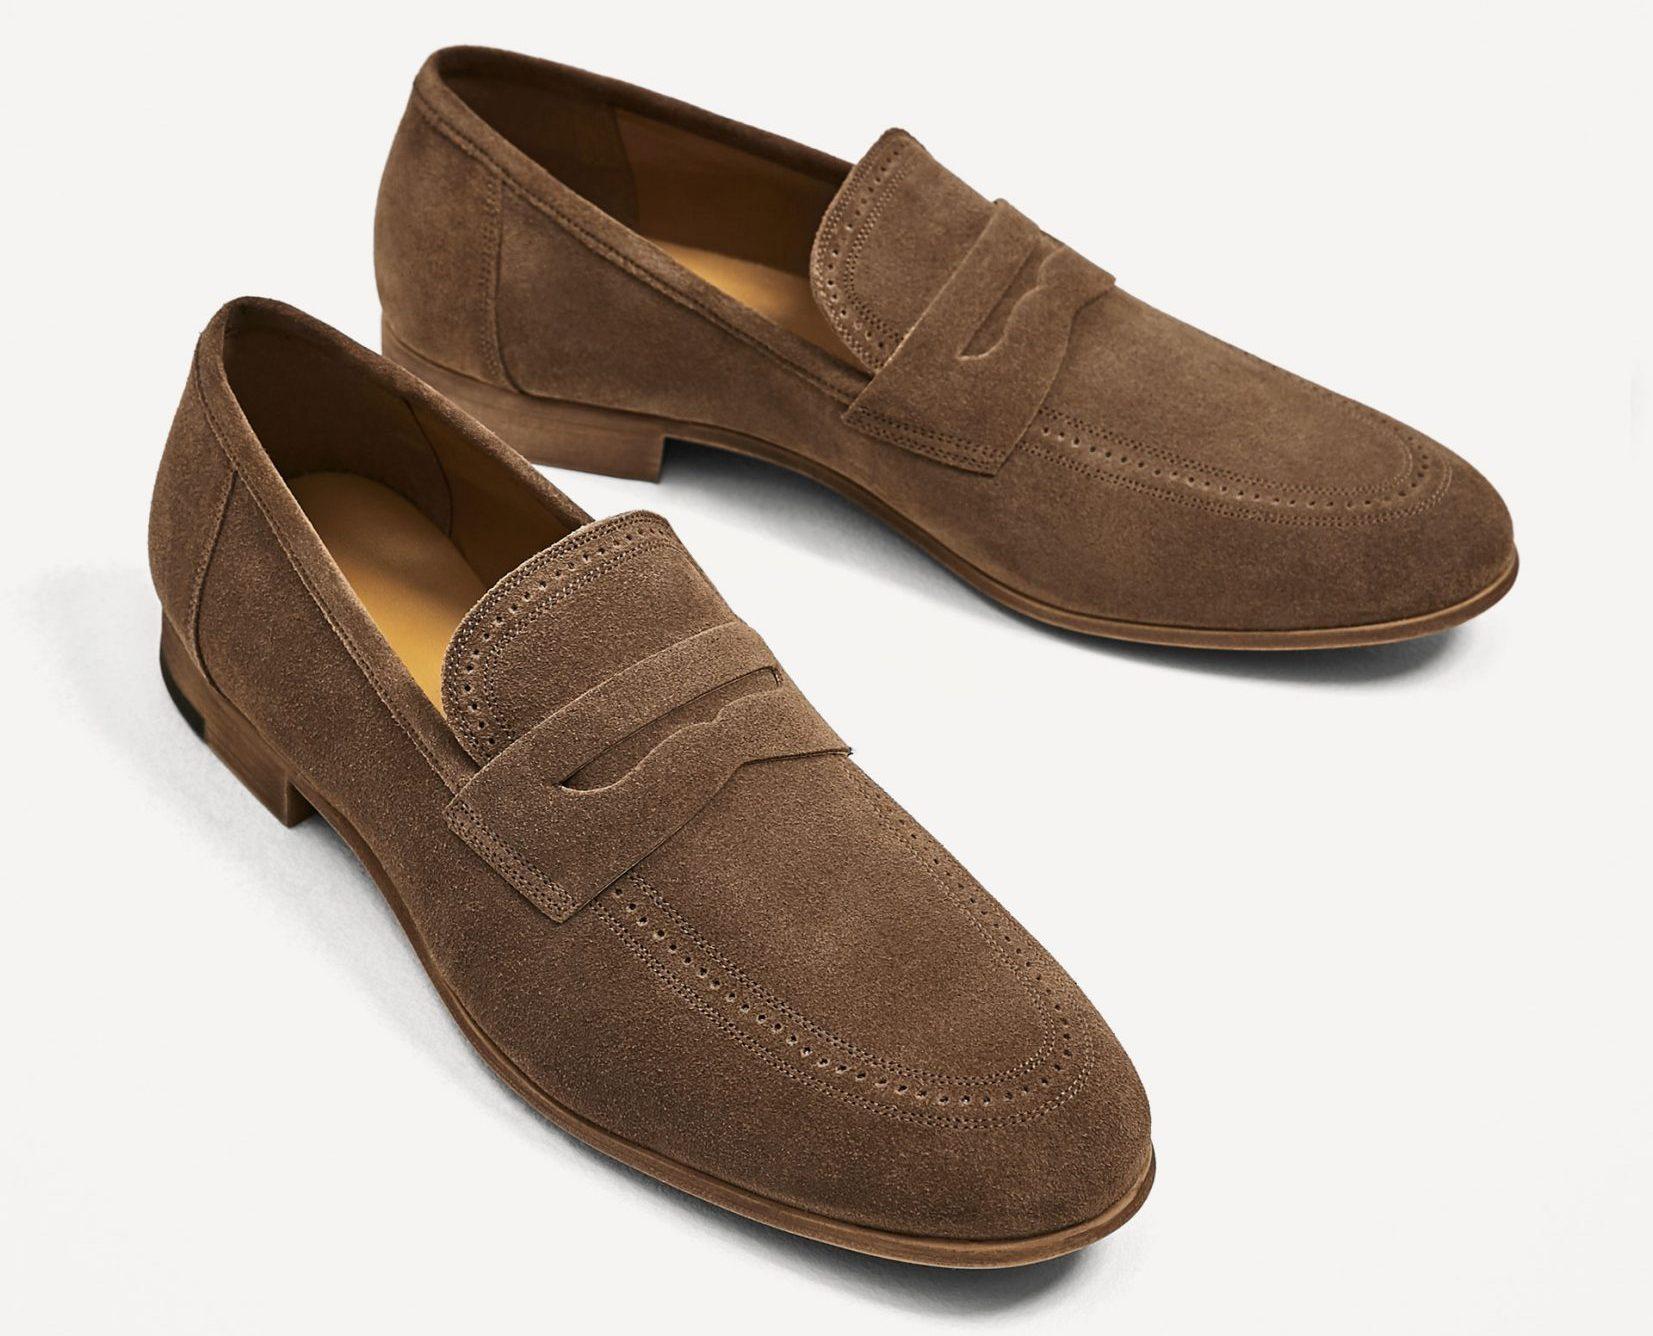 96ca59c86ba dapper advisor-affordable loafers-spring-summer-brown-suede-penny-